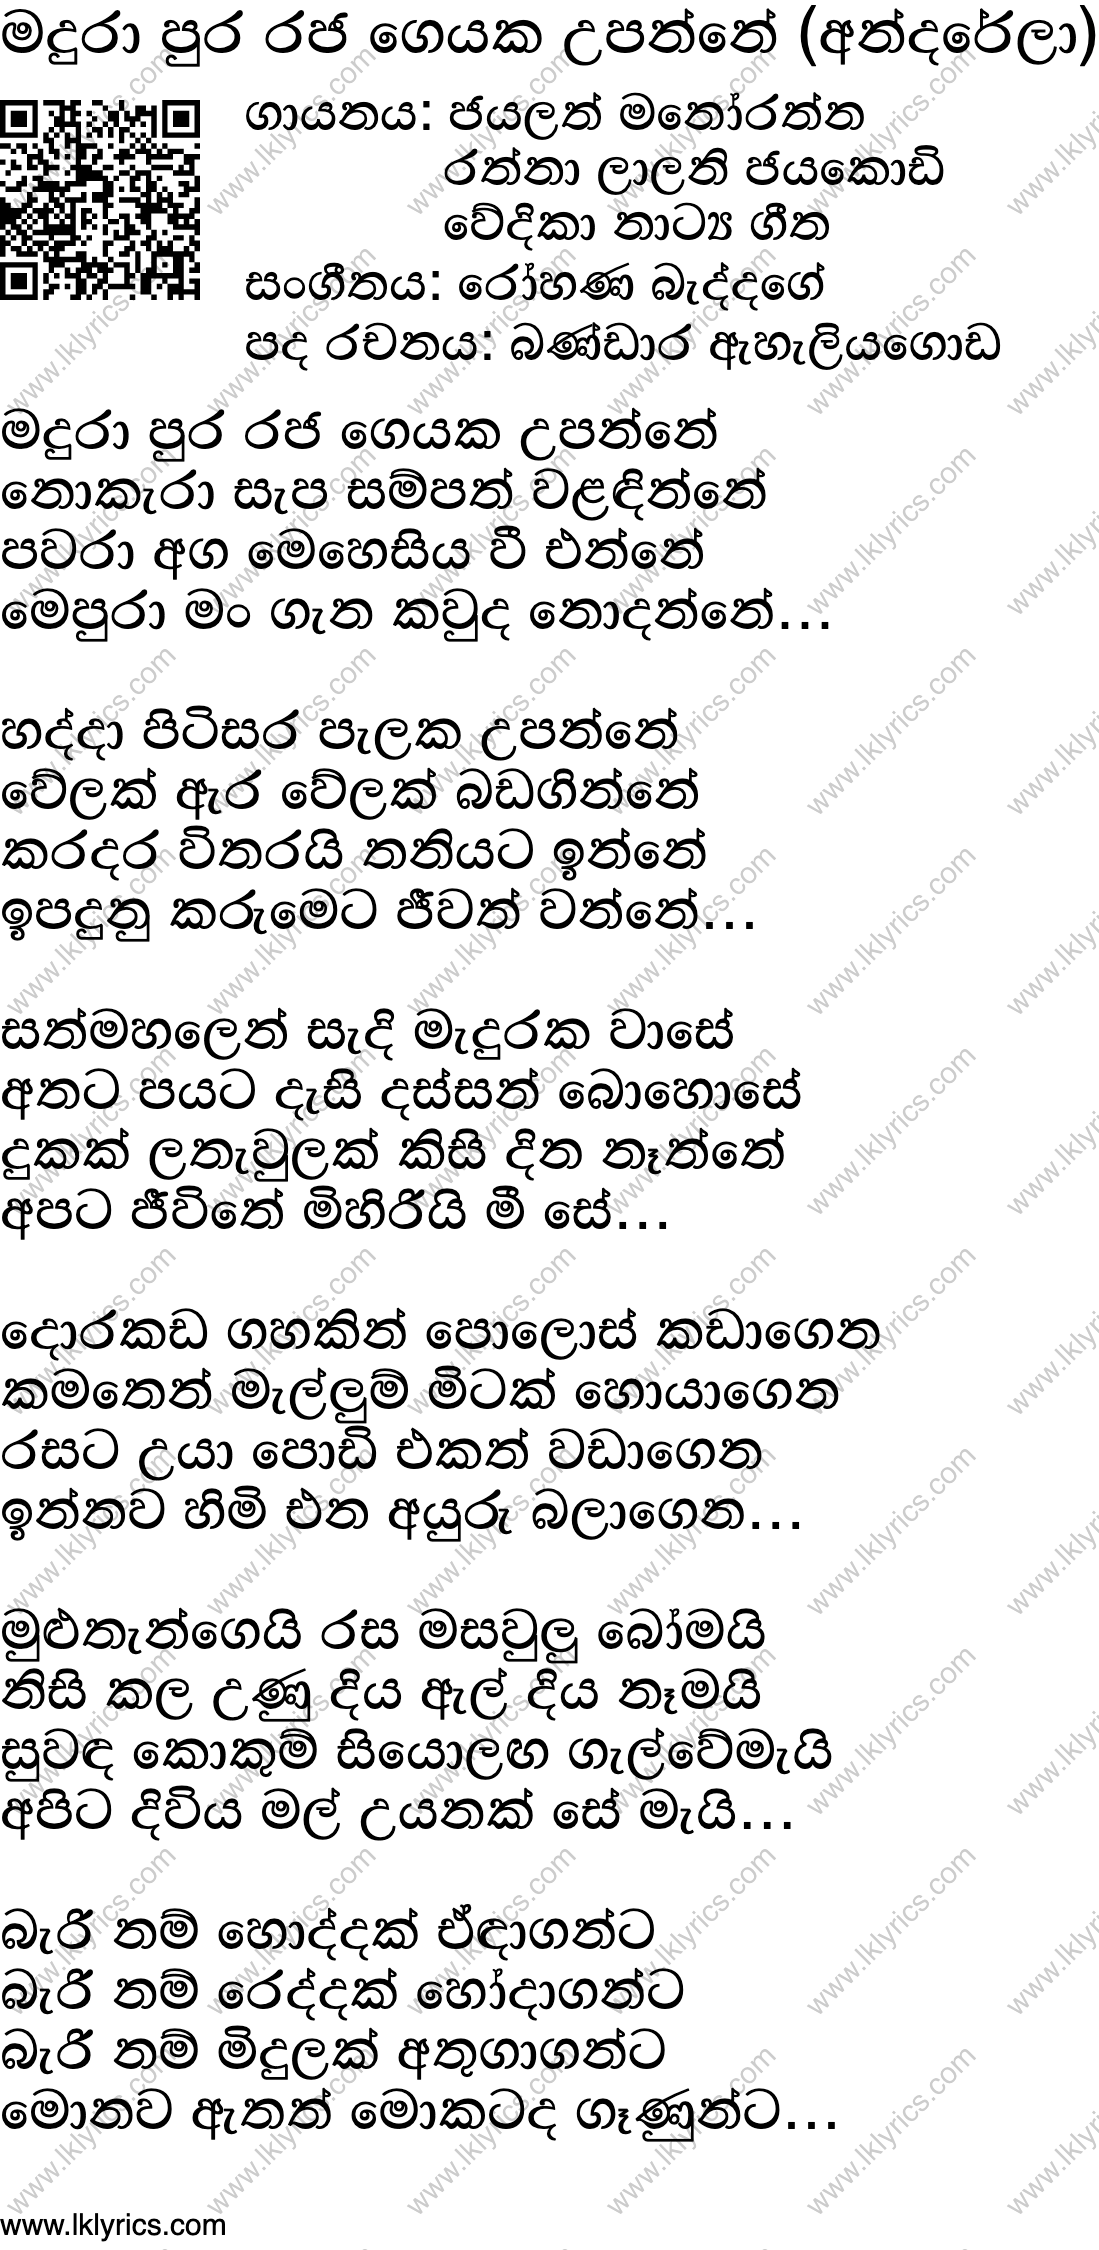 Giya weddo (maname) lyrics lk lyrics.